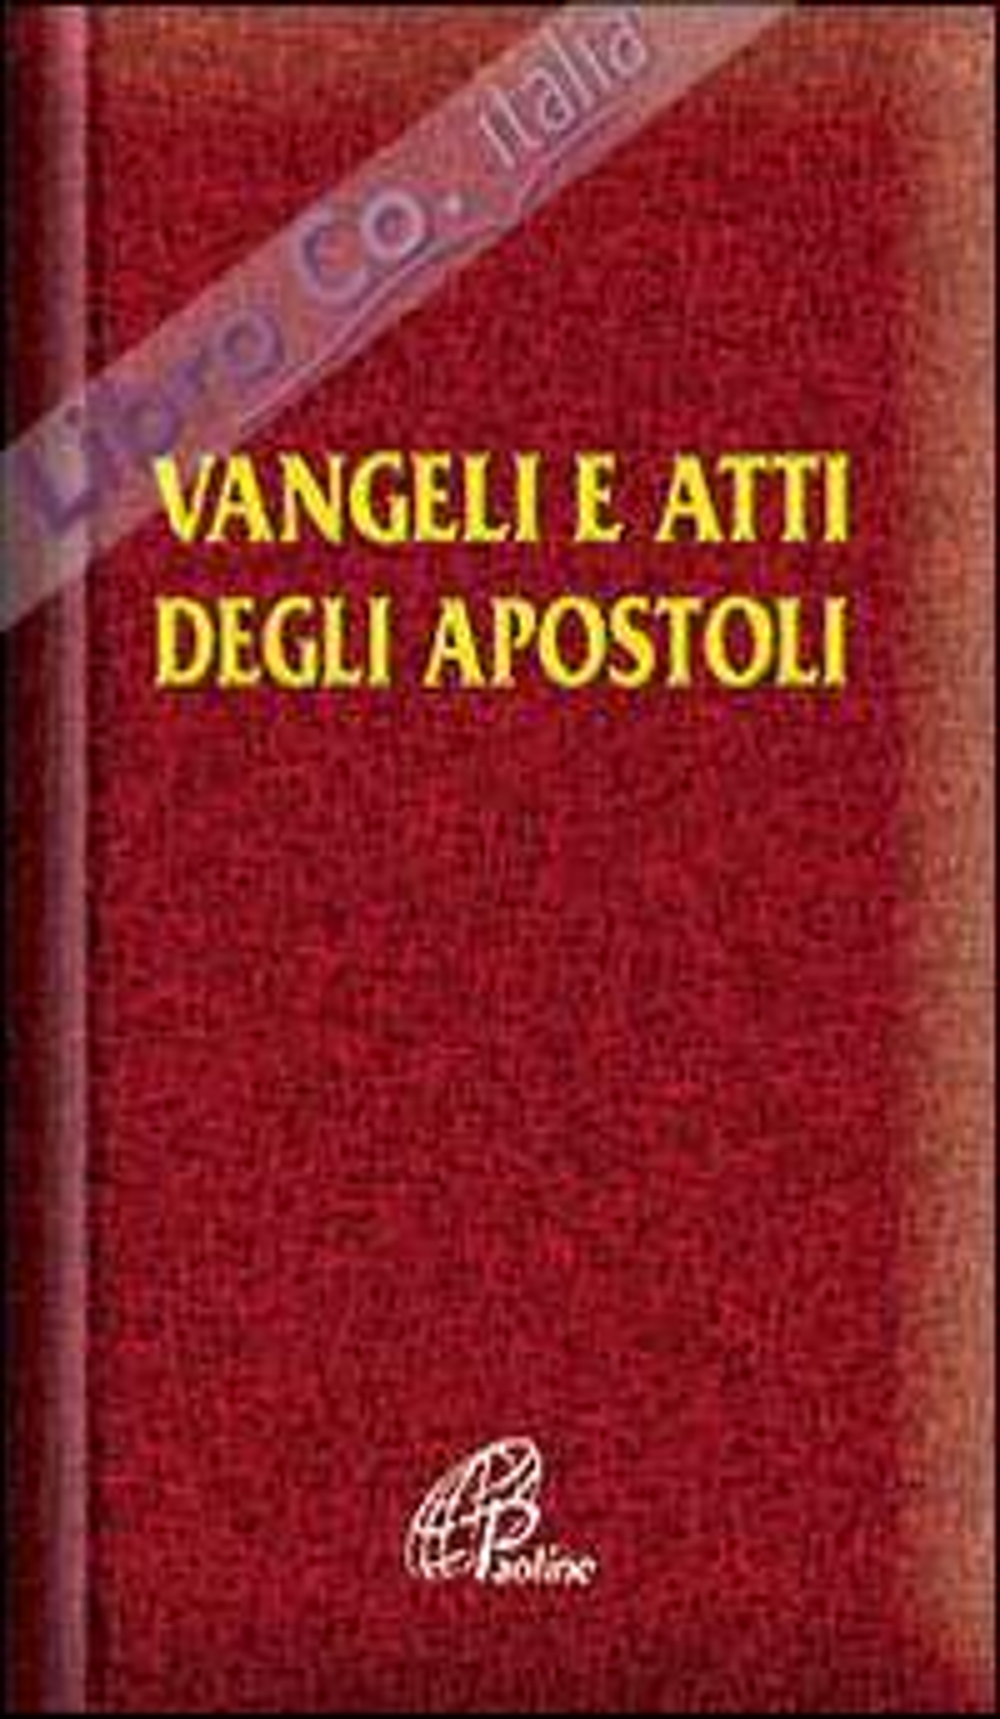 Vangelo e Atti degli Apostoli.